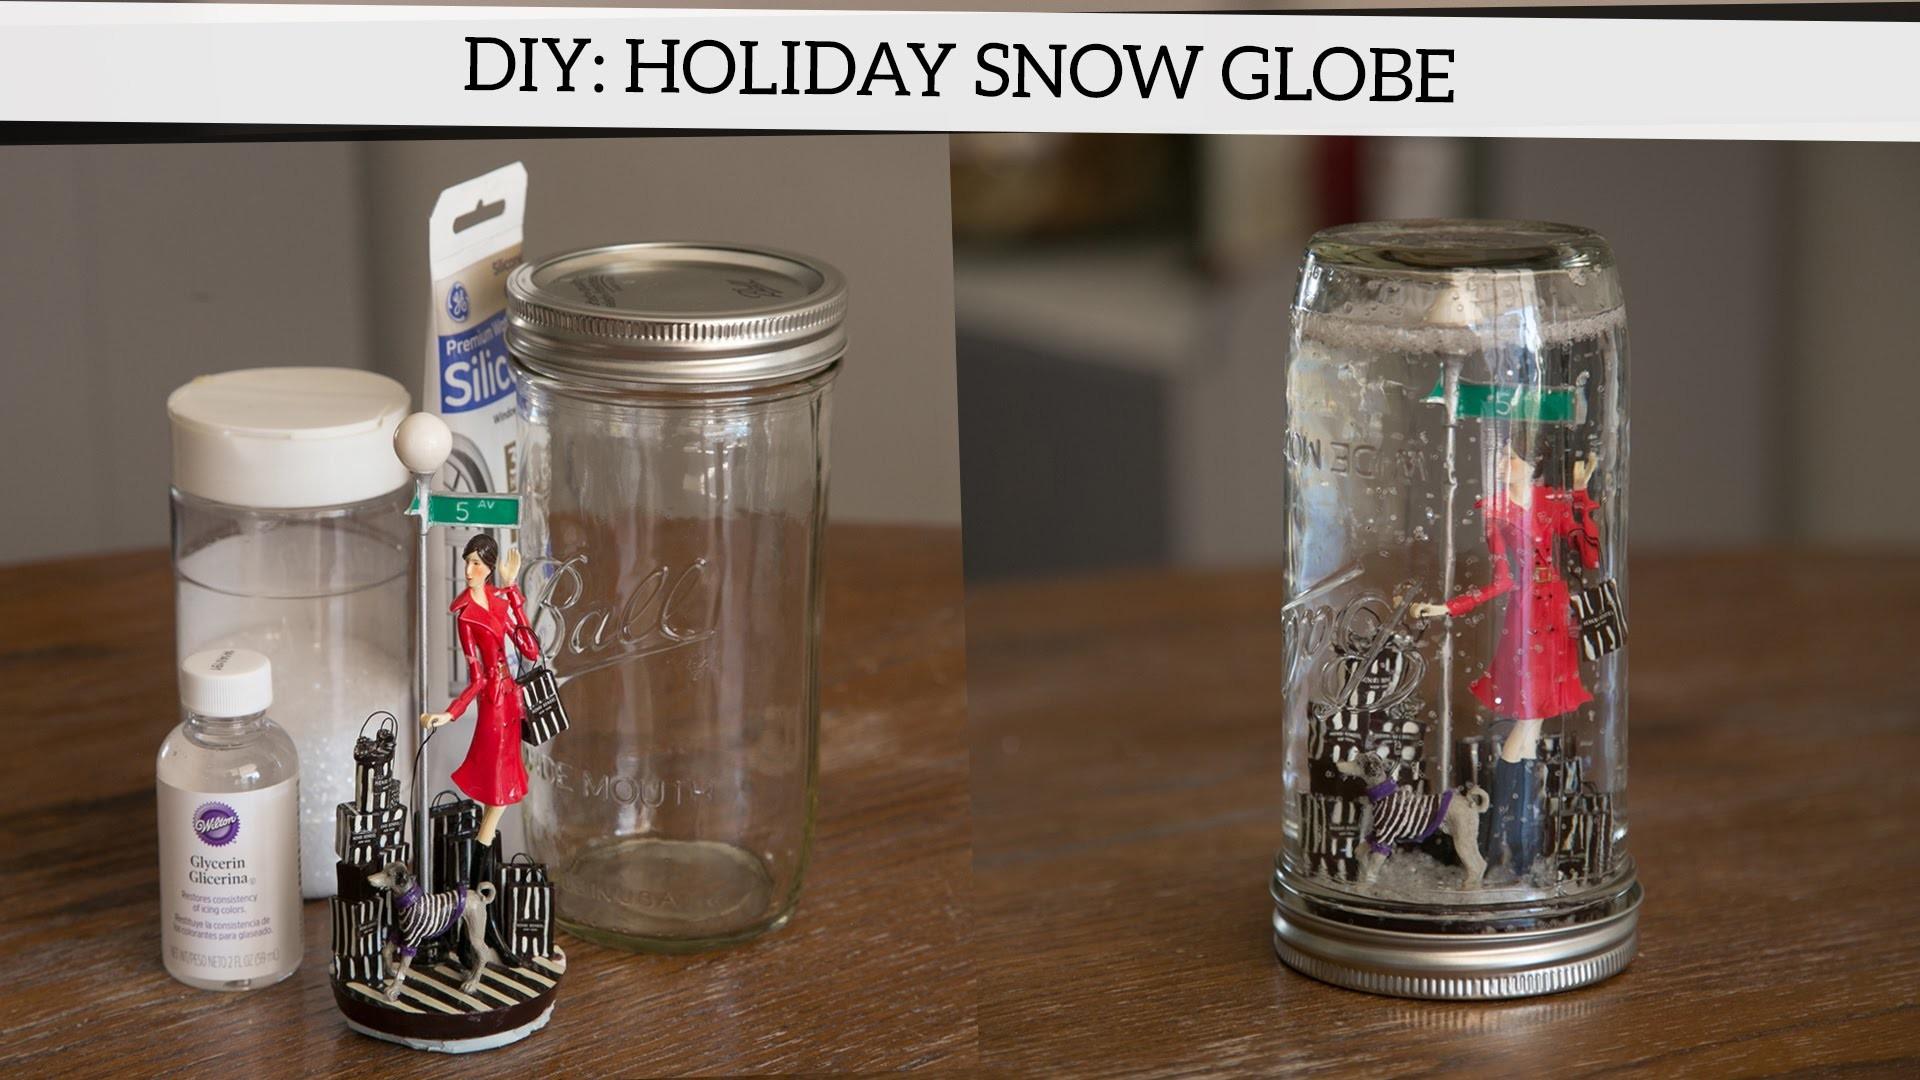 Holiday DIY: How to Make a Snow Globe